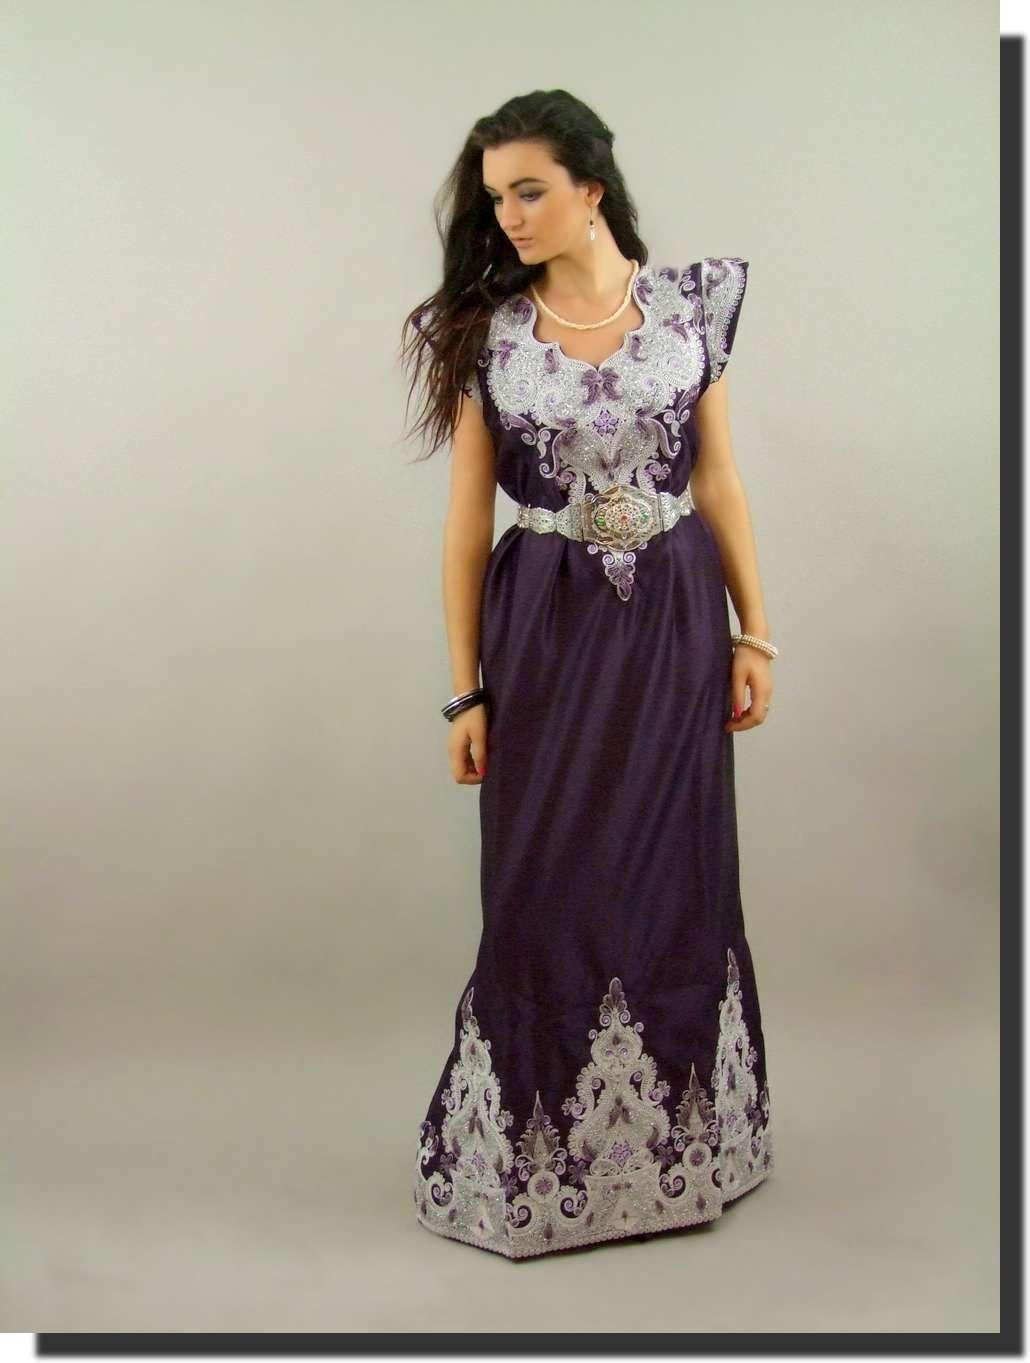 Vente robe soiree sur alger